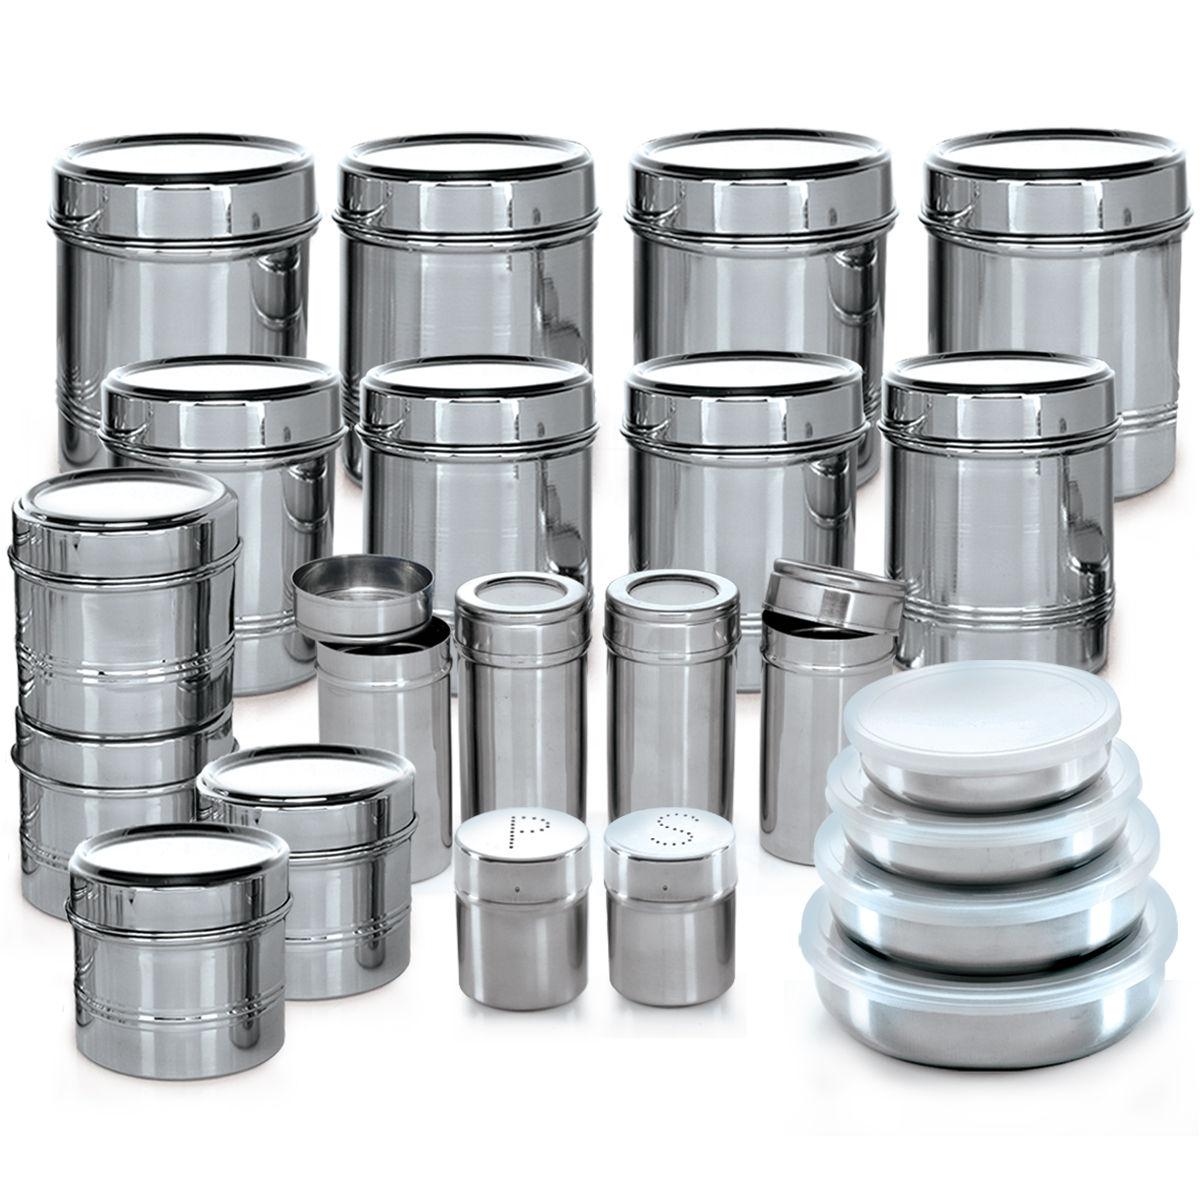 Kitchen Set Steel: Buy Branded 44 Pcs. Stainless Steel Storage Set Online At